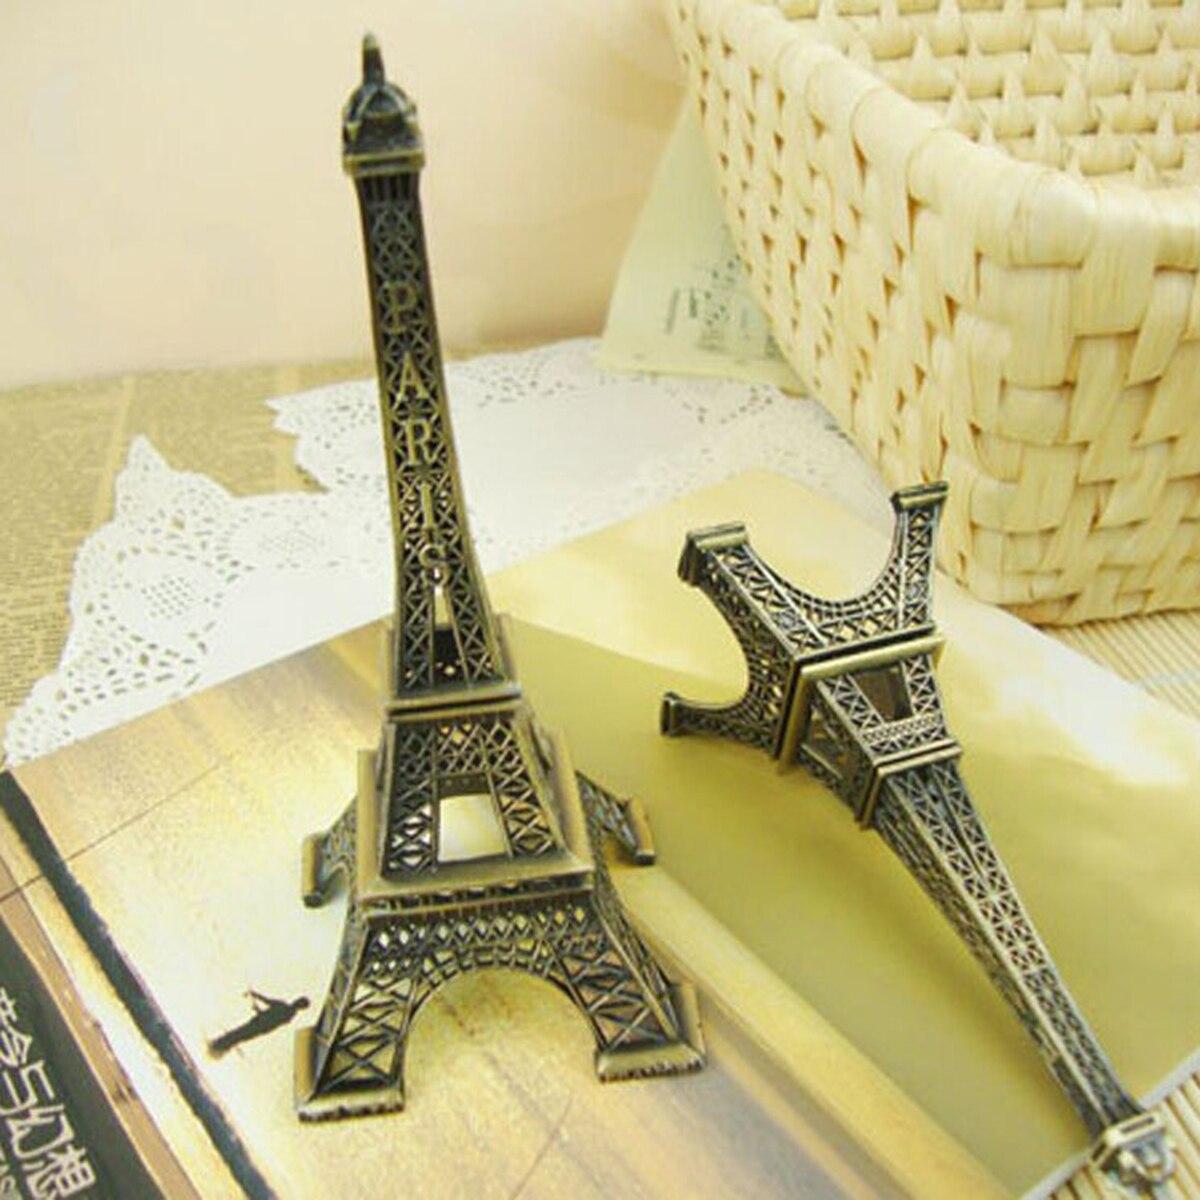 Metal Eiffel Tower Statue 12 Inches Eiffel Tower Model Souvenir ...